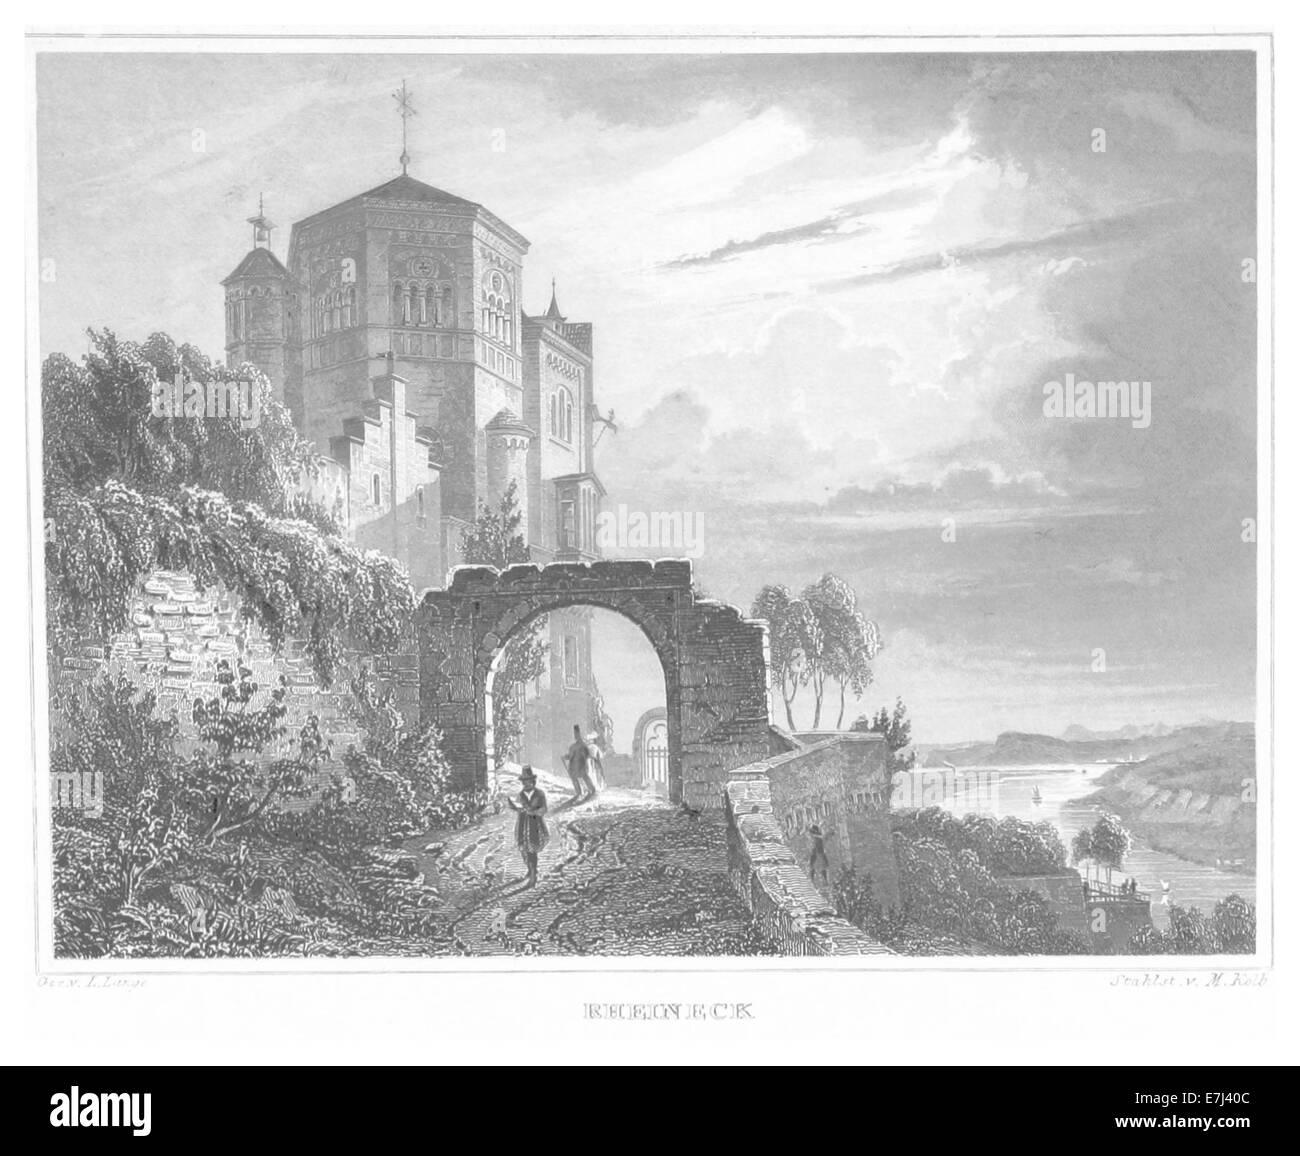 POPPEL(1852) p653 RHEINECK - Stock Image